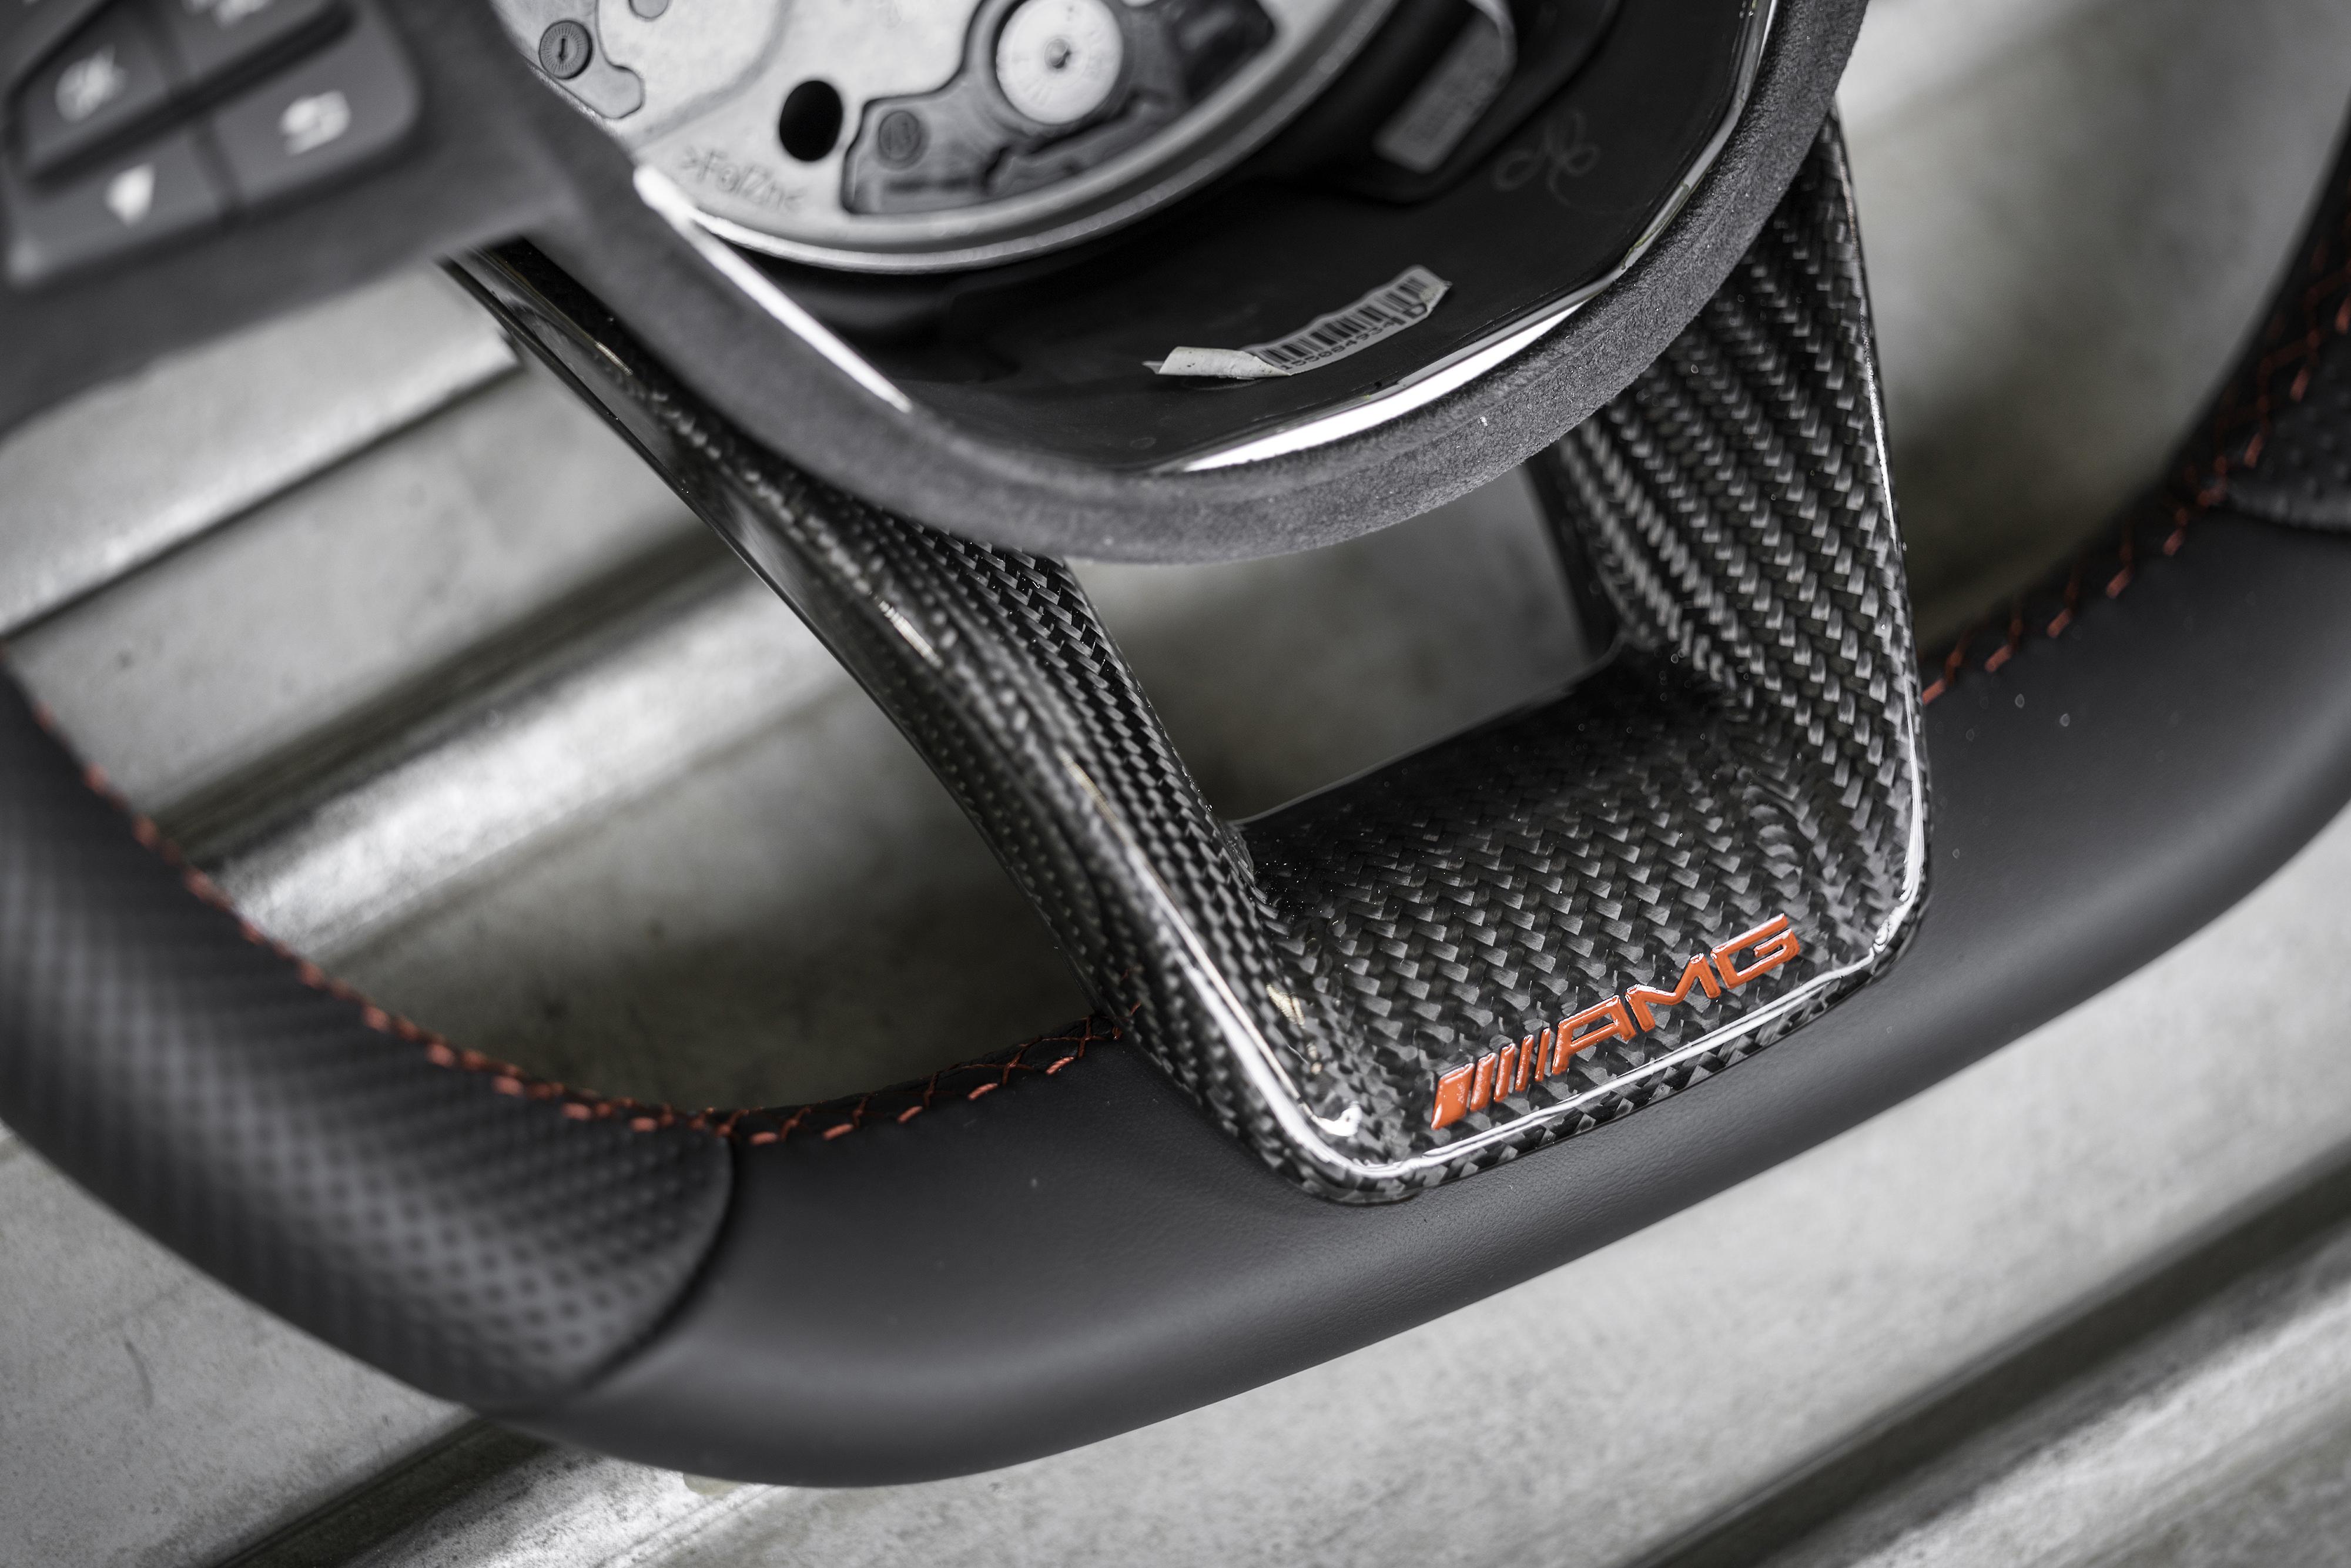 amg carbon fiber steering wheel